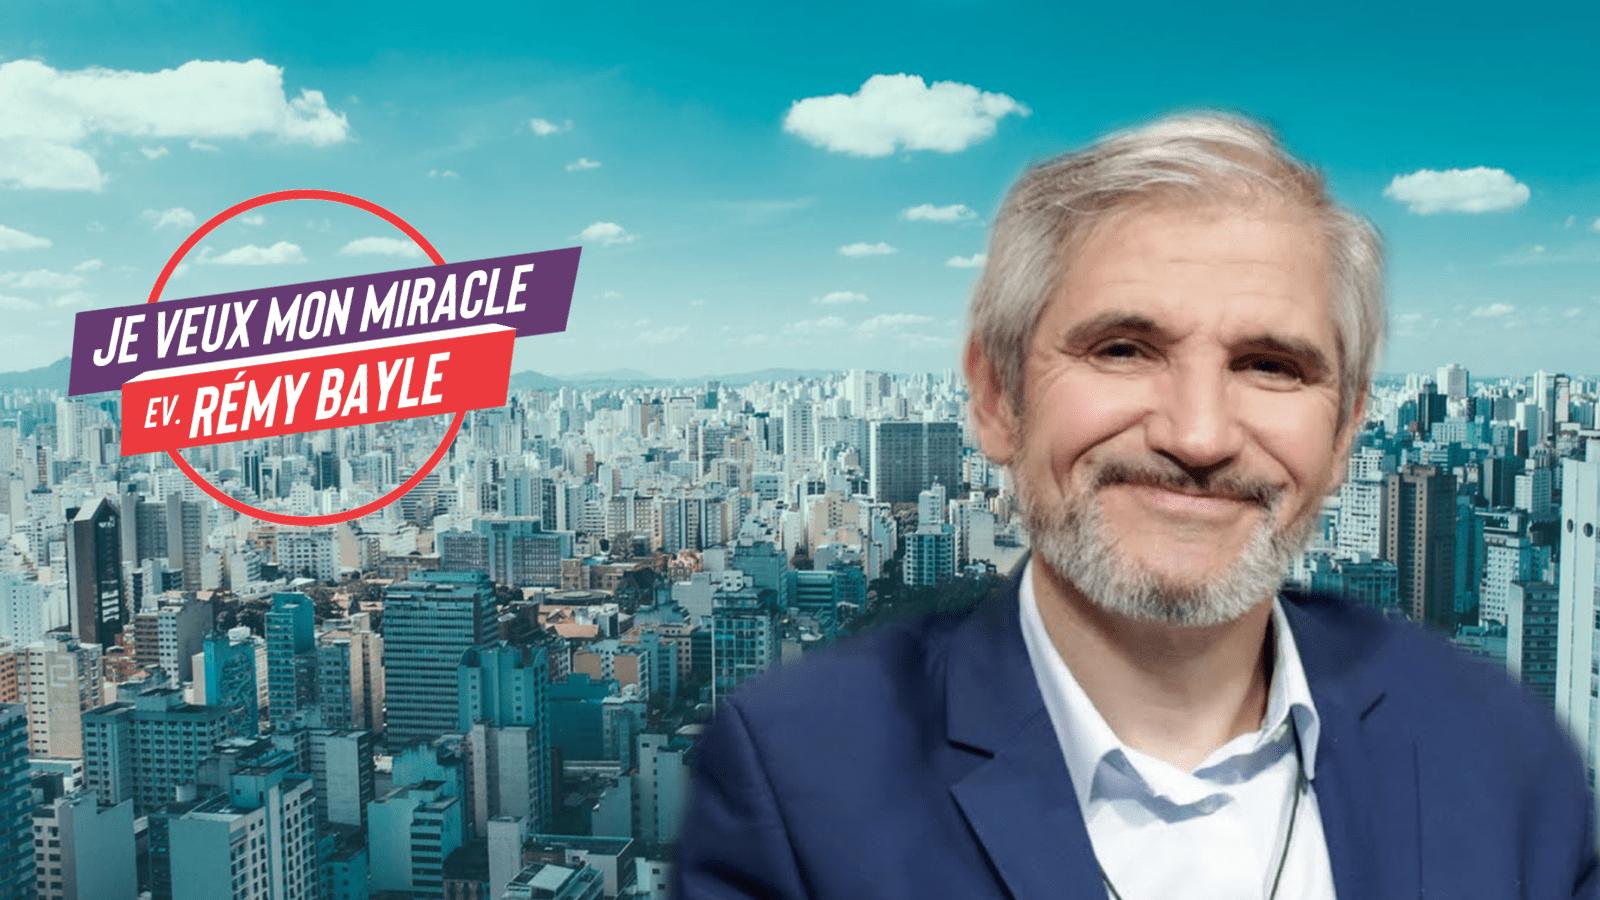 Je veux mon Miracle by Rémy Bayle